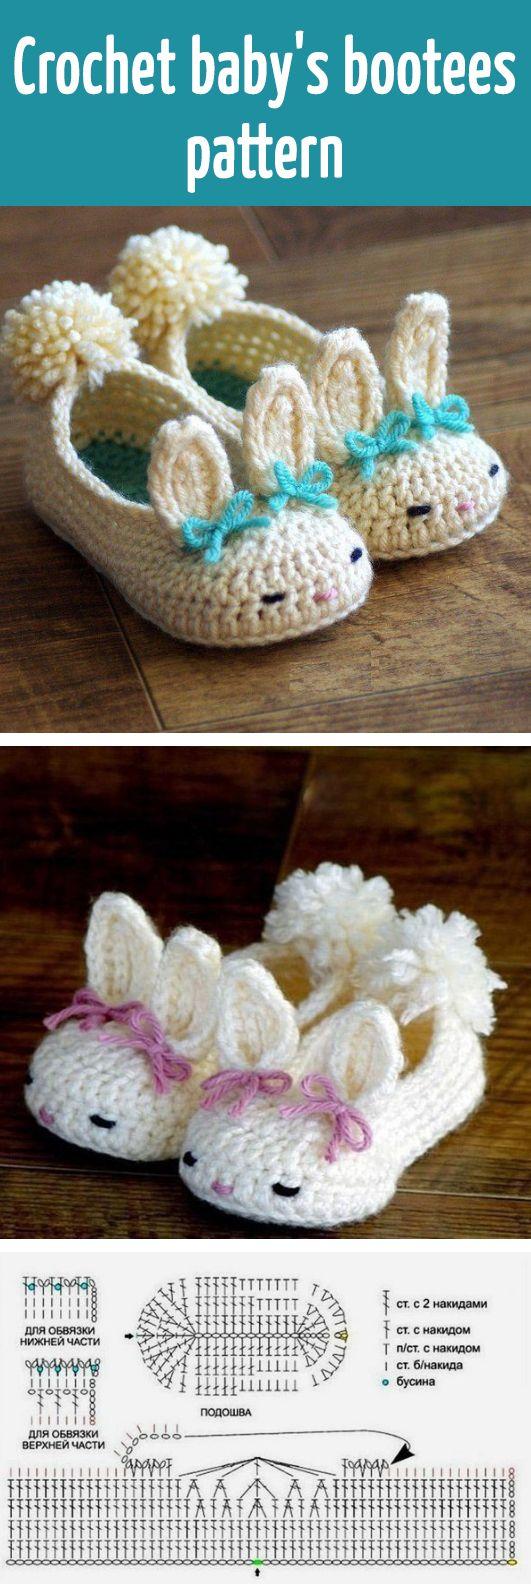 Crochet babys bootees pattern